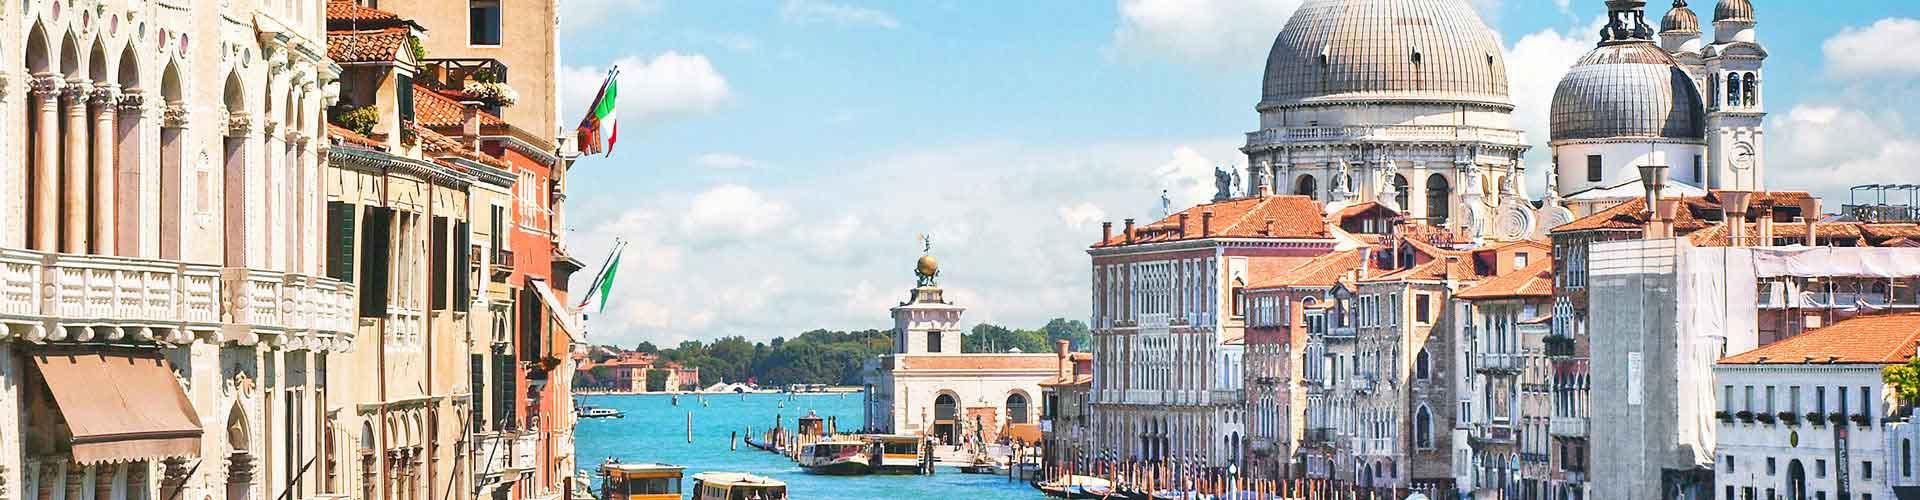 Venezia – Ostelli a Venezia. Mappe per Venezia, Foto e  Recensioni per ogni Ostello a Venezia.